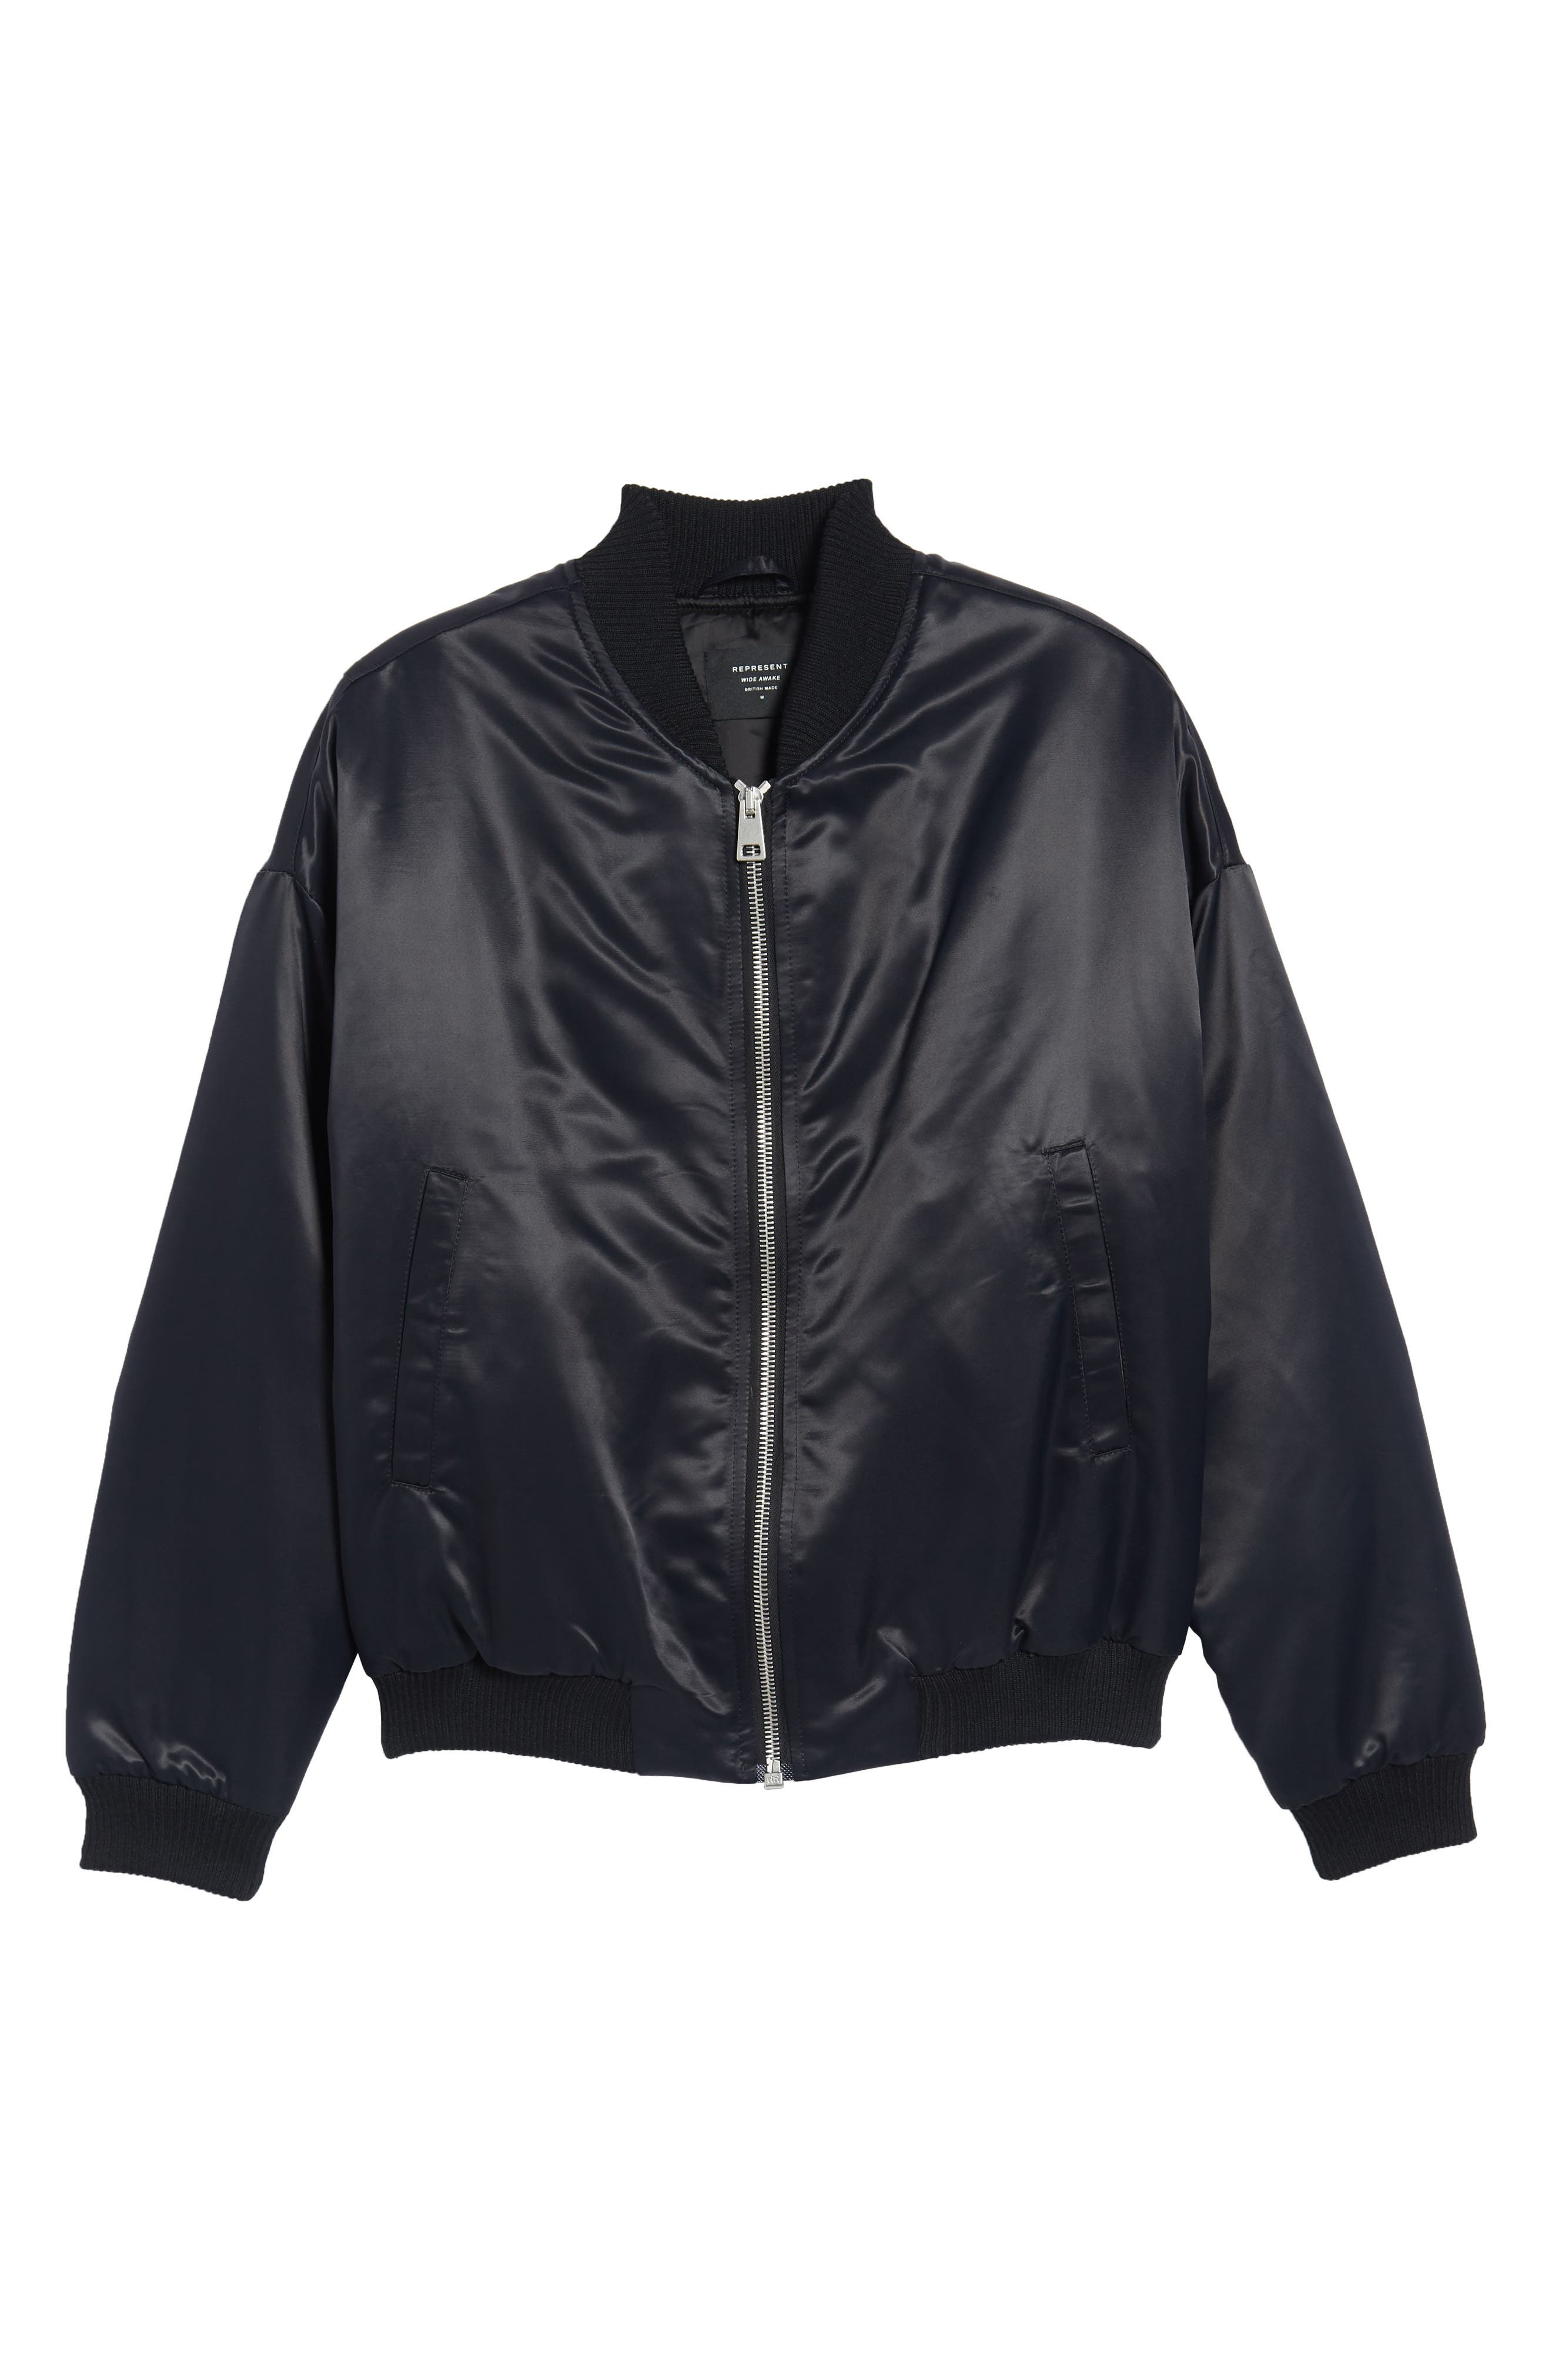 Standard Bomber Jacket,                             Alternate thumbnail 5, color,                             001